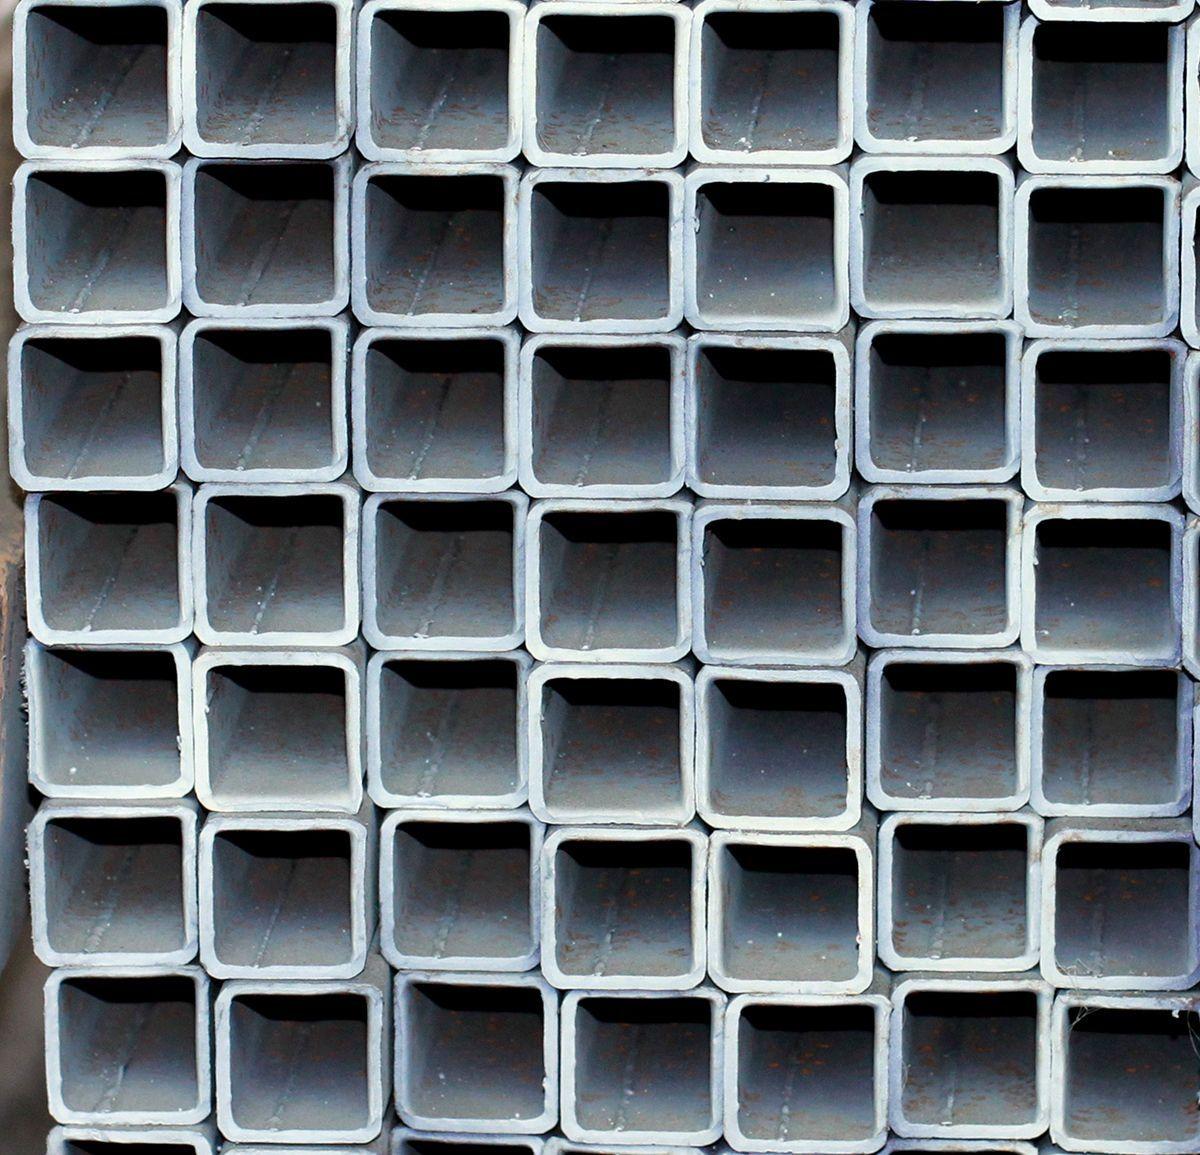 25 Galvanized Square Tubing 2 12 X 24 14 Gauge Tampa Steel Metal Carport Tubing Metal Carports Carport Designs Custom Carports